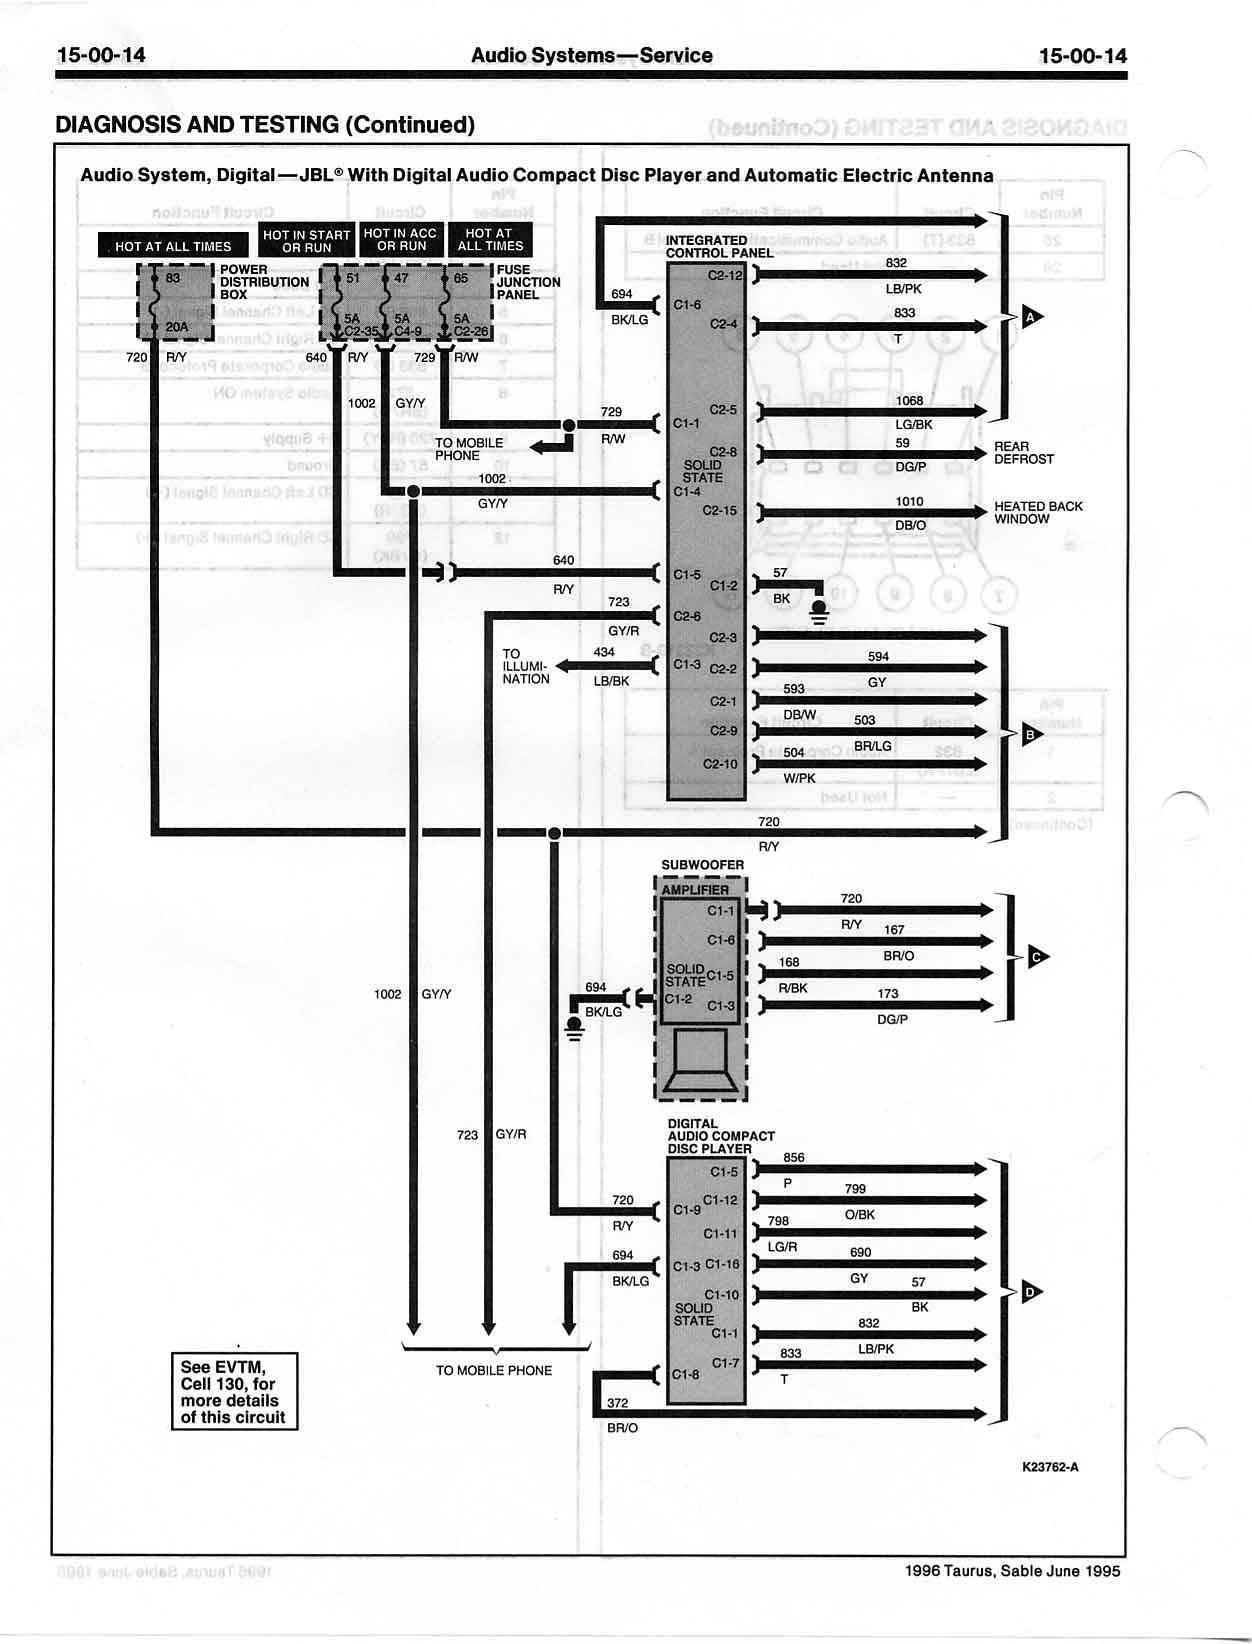 2001 ford taurus rcu wiring diagram wiring diagram 2000 Ford Taurus DRL Wiring 2001 ford taurus rcu wiring diagram gen 3 jbl rcu sub output speaker or line level? taurus car clubfile type jpeg